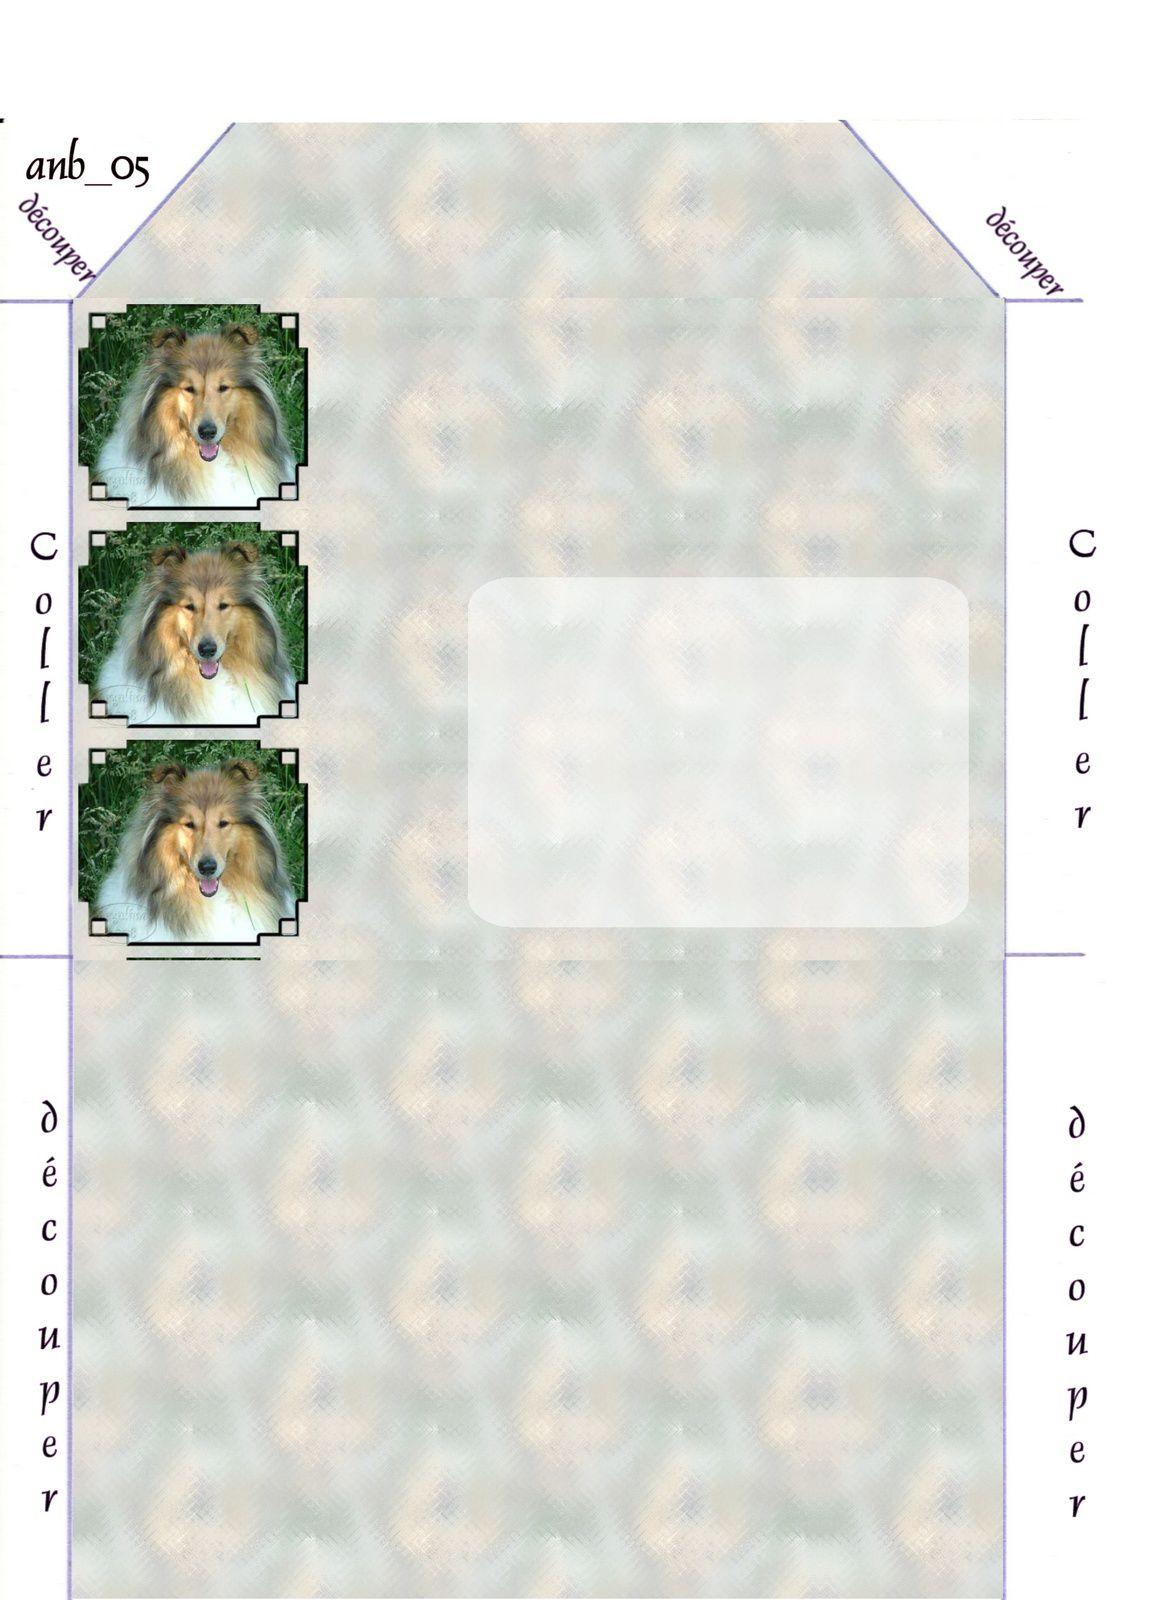 Colley Incredimail &amp&#x3B; Papier A4 h l &amp&#x3B; outlook &amp&#x3B; enveloppe &amp&#x3B; 2 cartes A5 &amp&#x3B; signets 3 langues    chien_dscf17351a